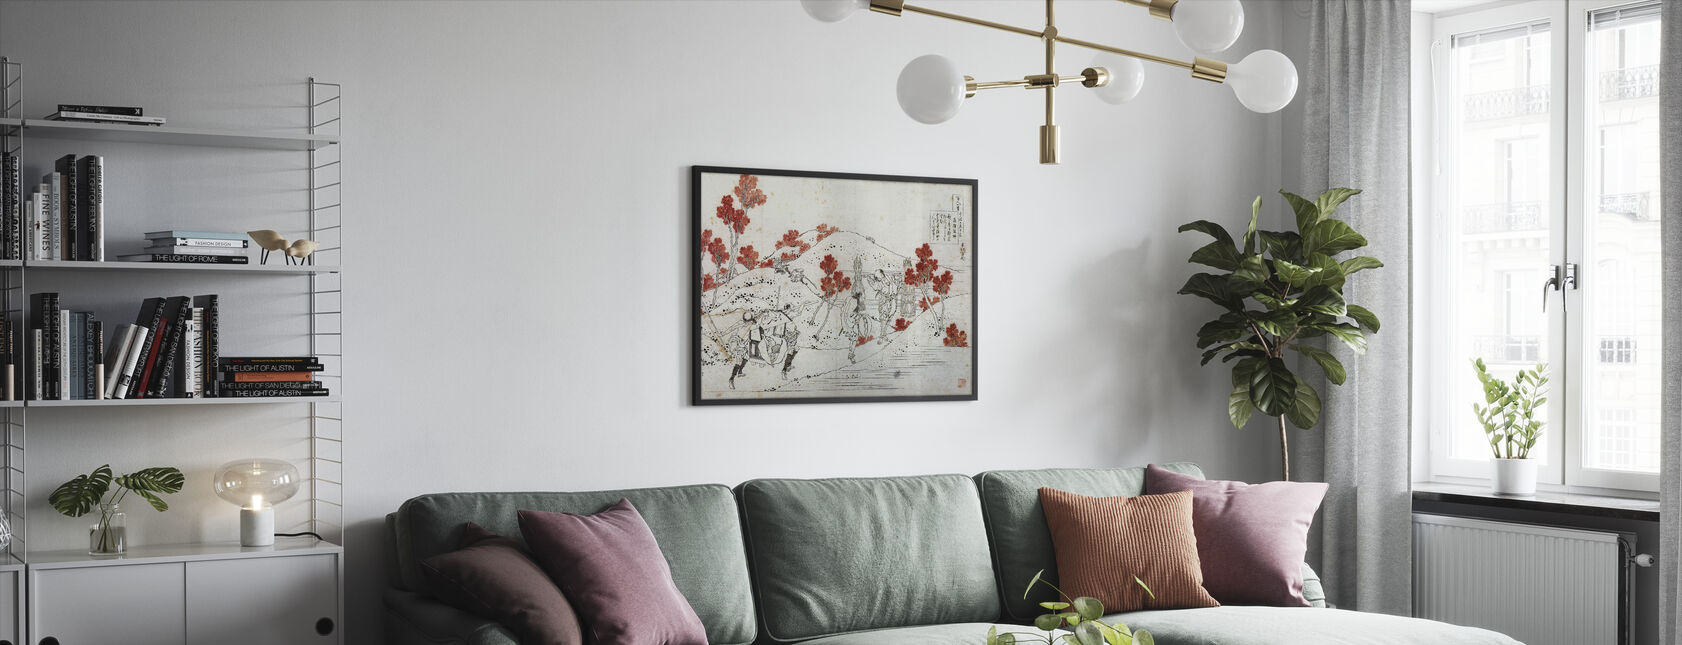 Porters Carry Palanquin, Katsushika Hokusai - Kehystetty kuva - Olohuone